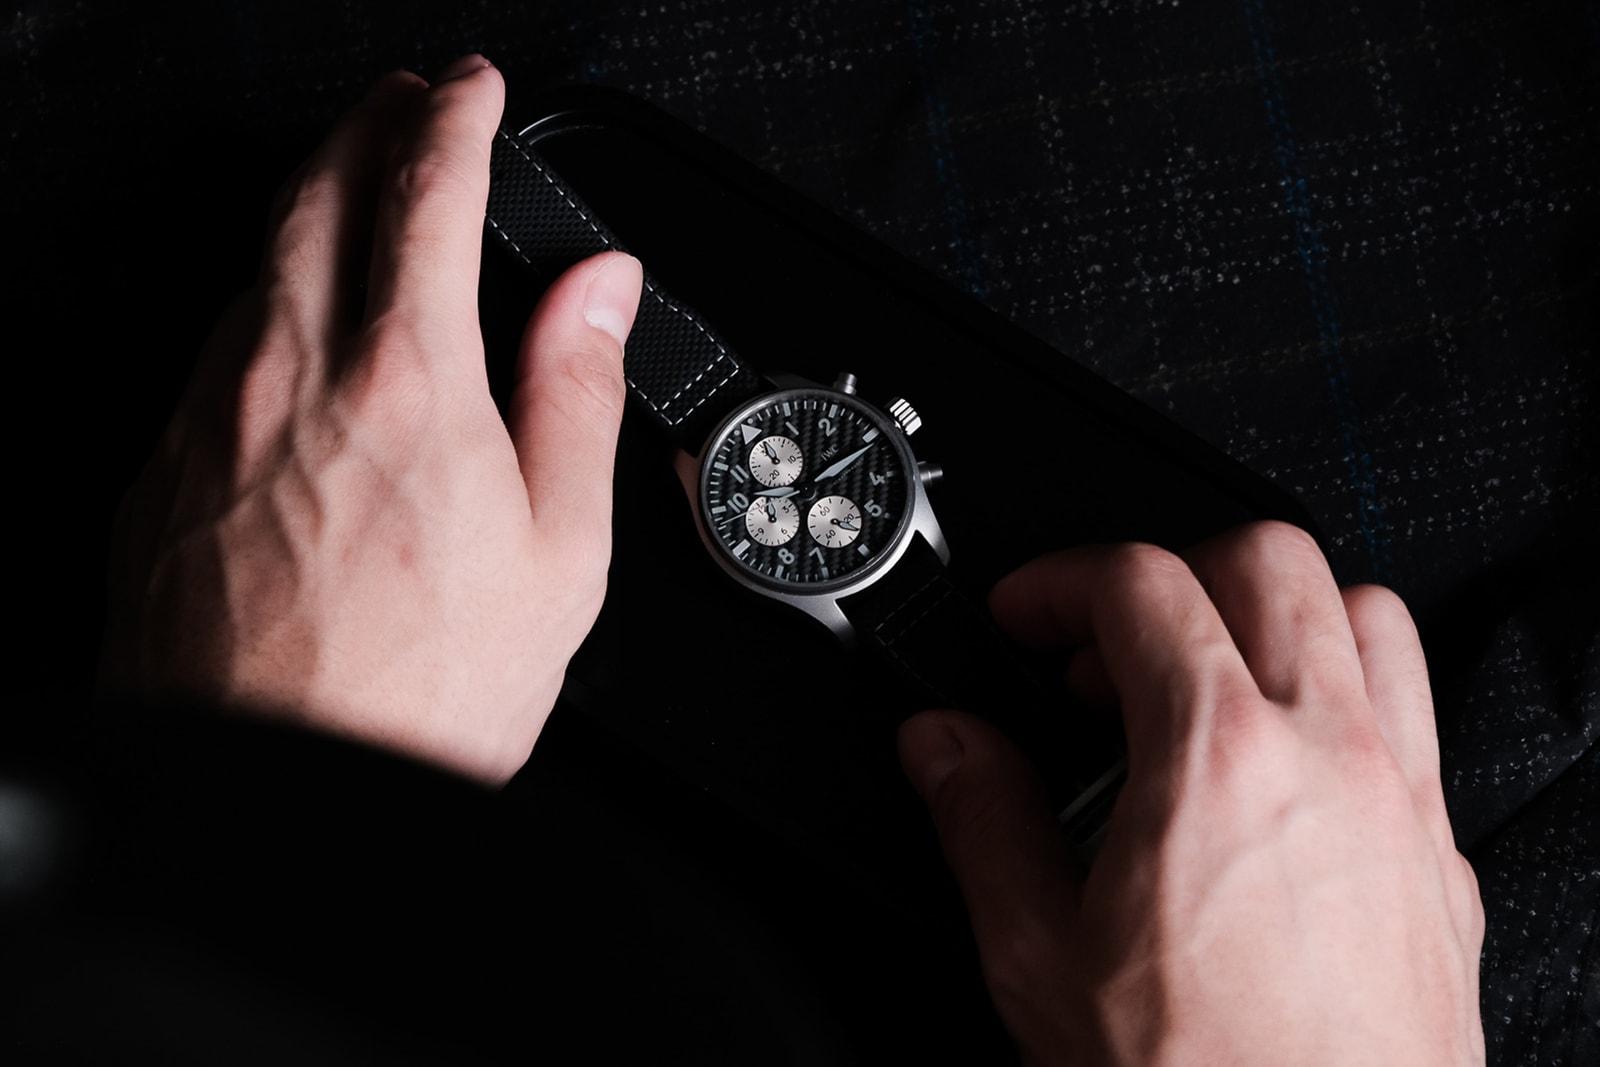 造車工藝移植 獨家開箱 IWC Pilot's Watch Chronograph Edition「AMG」聯名腕錶